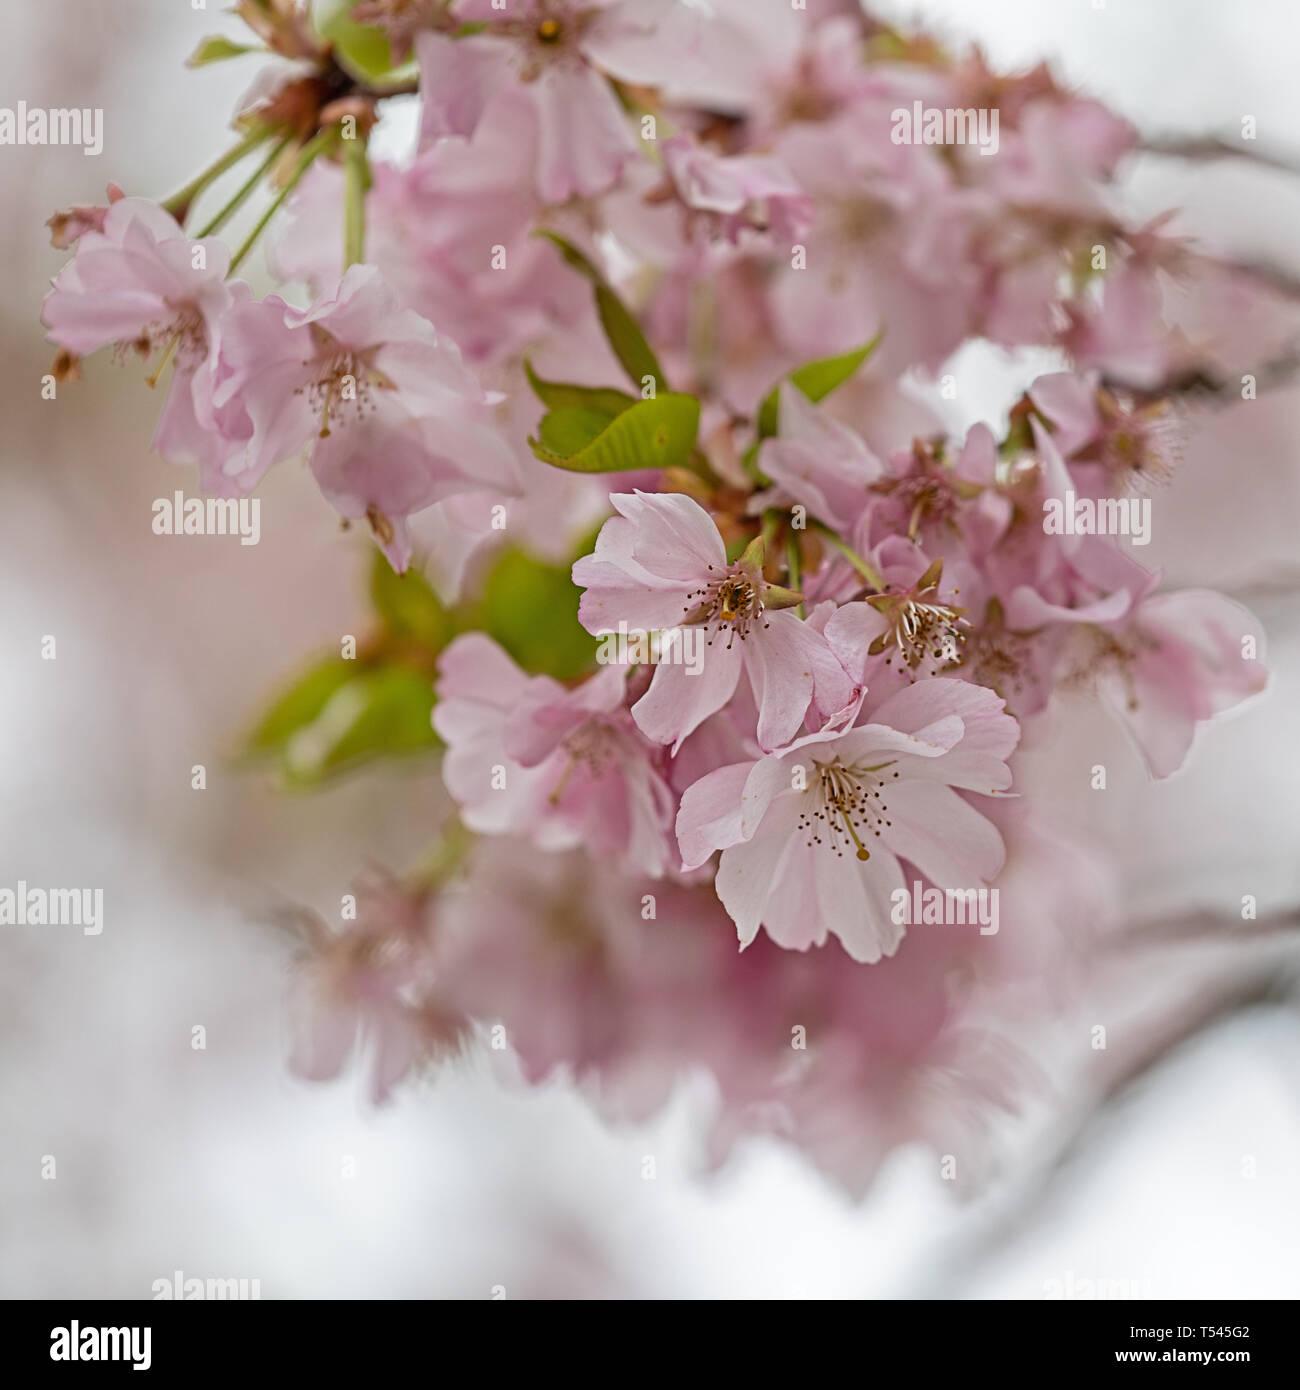 Onirica fioriture primaverili tutto Immagini Stock